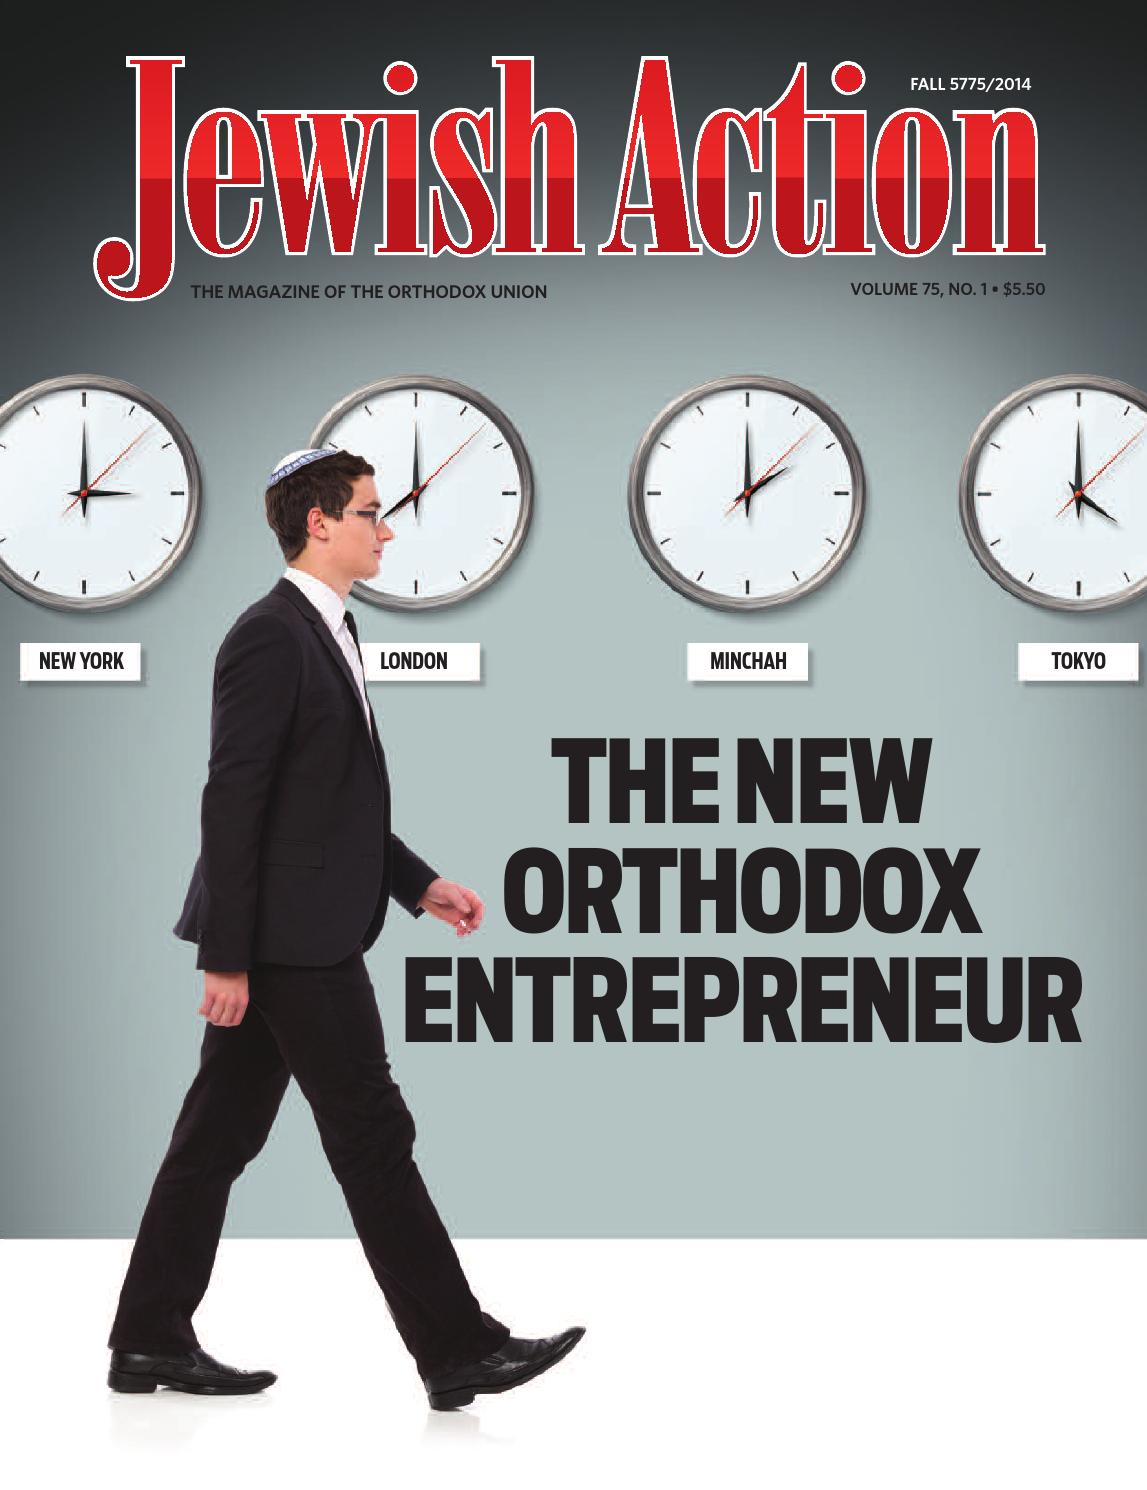 Tehillim Spreadsheet For Jewish Action Fall 2014Orthodox Union  Issuu